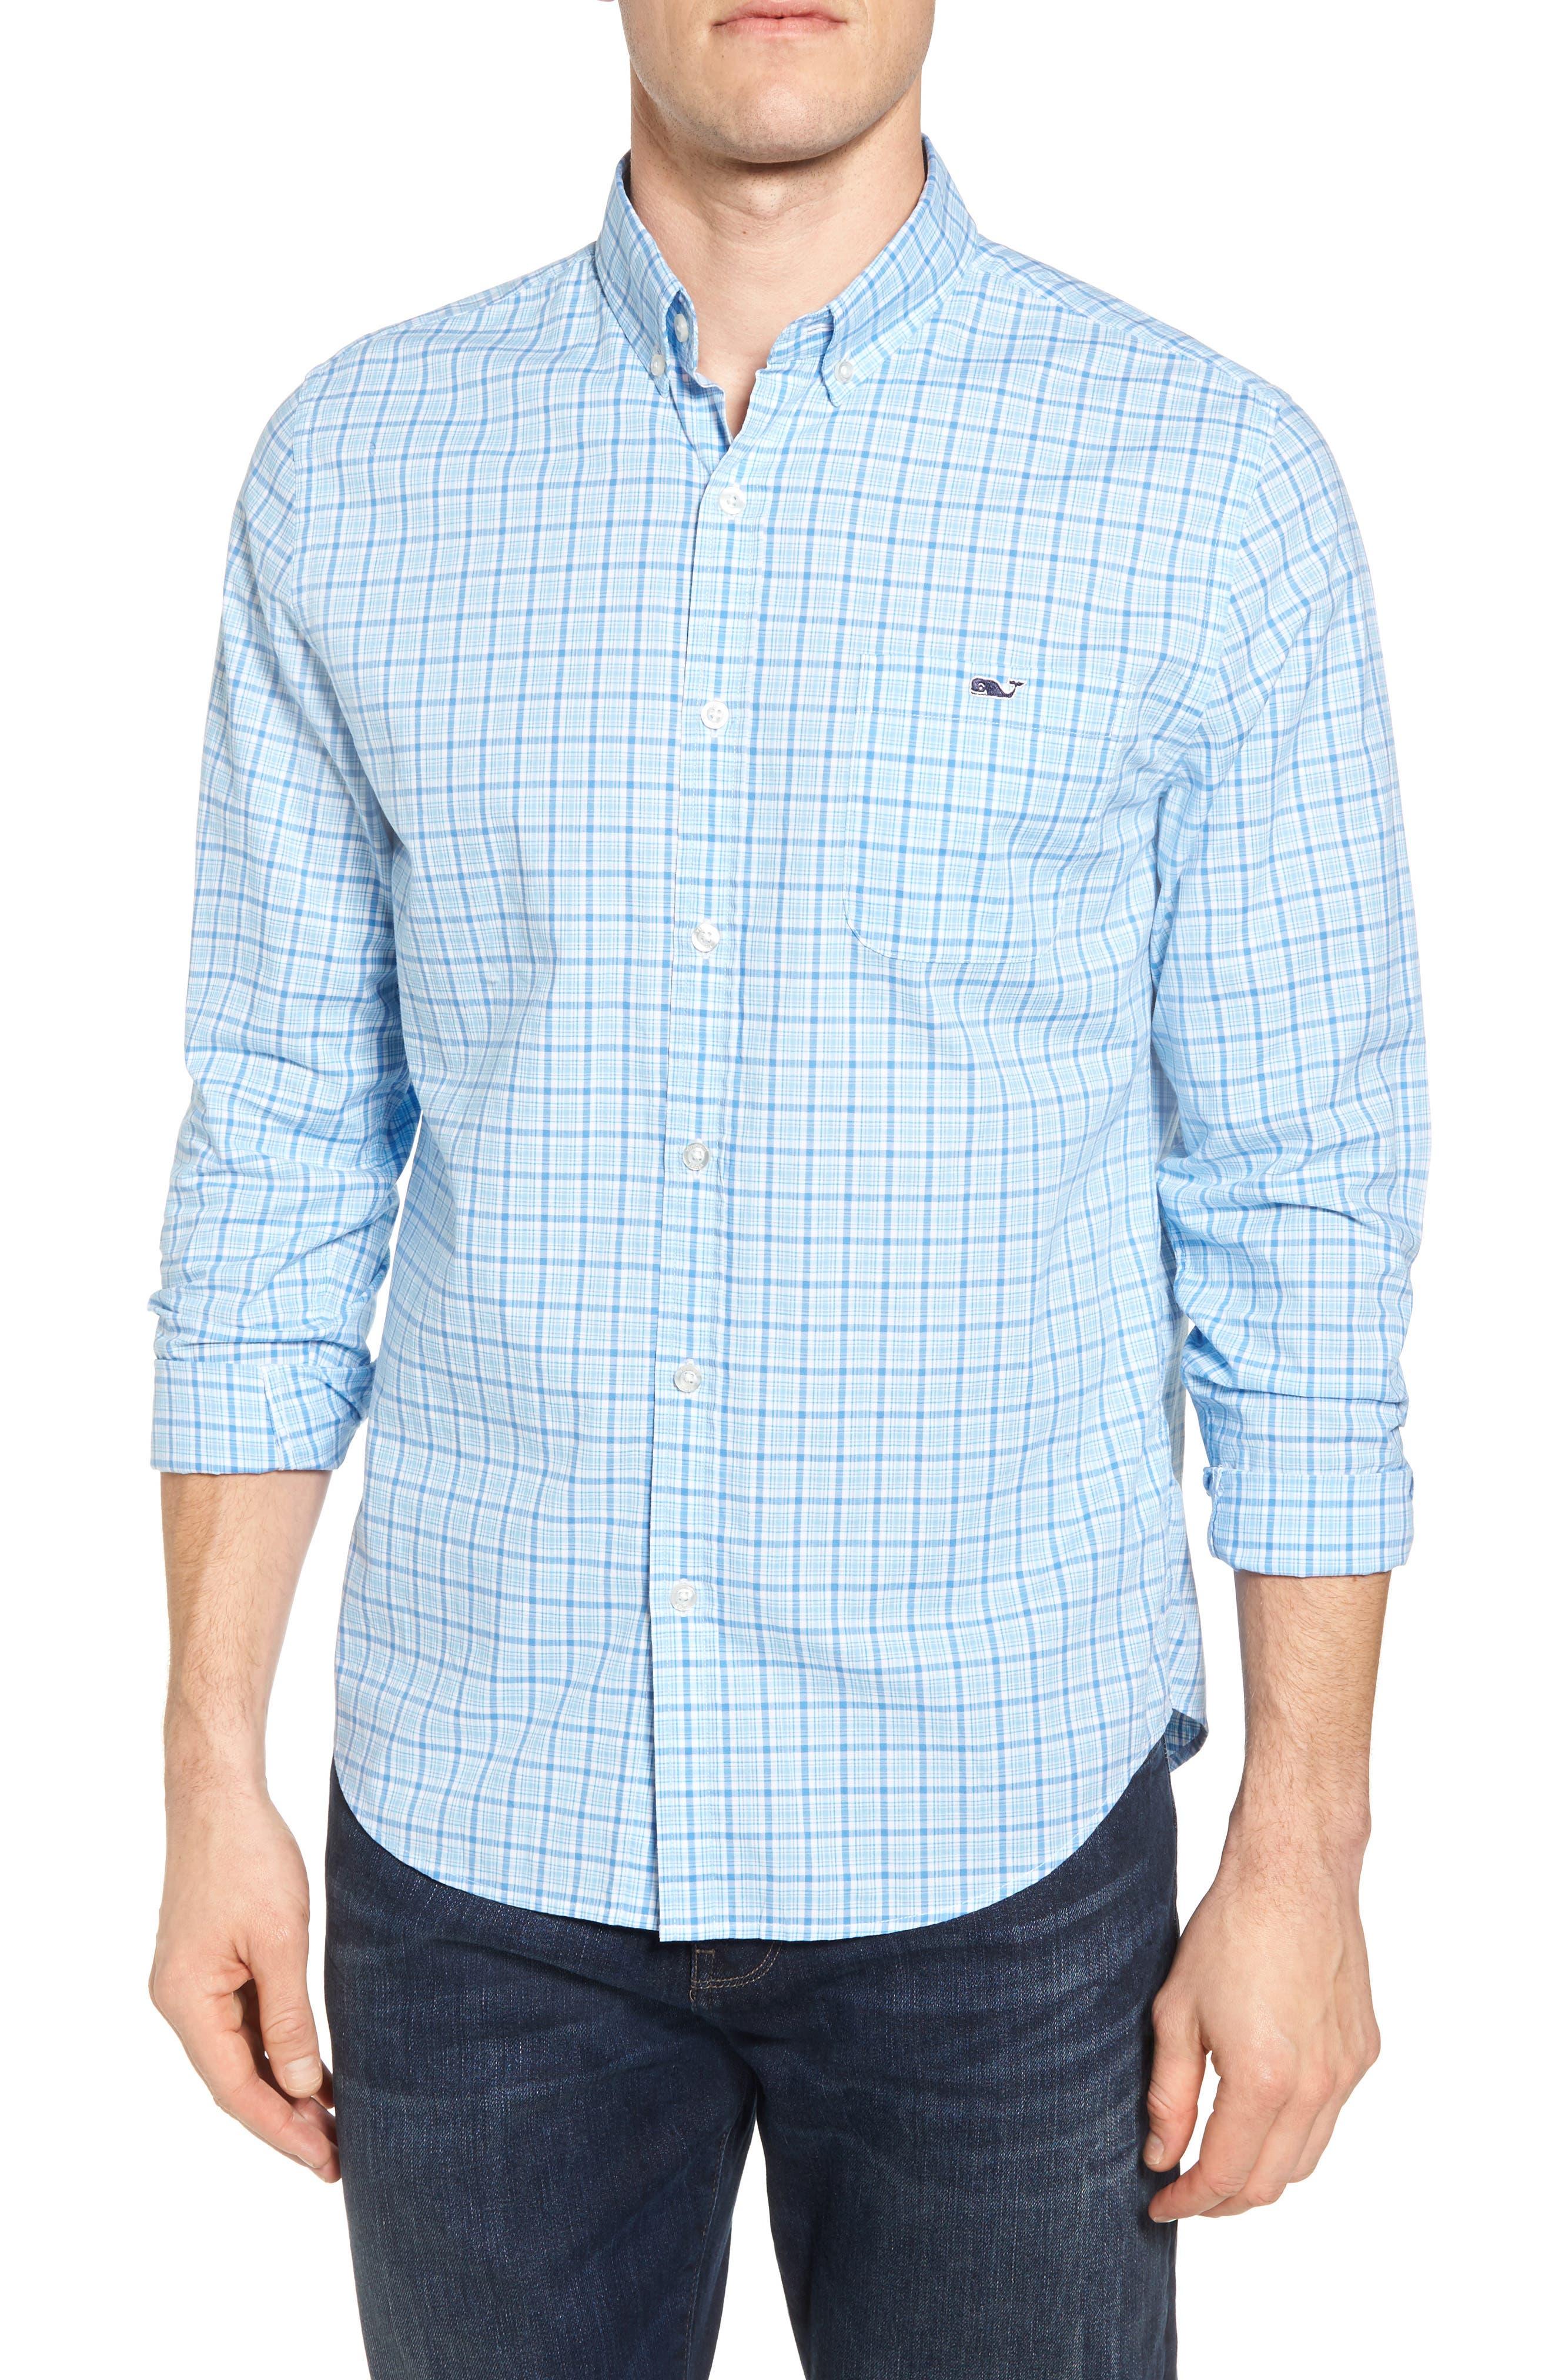 Seawatch Slim Fit Plaid Sport Shirt,                         Main,                         color, 459